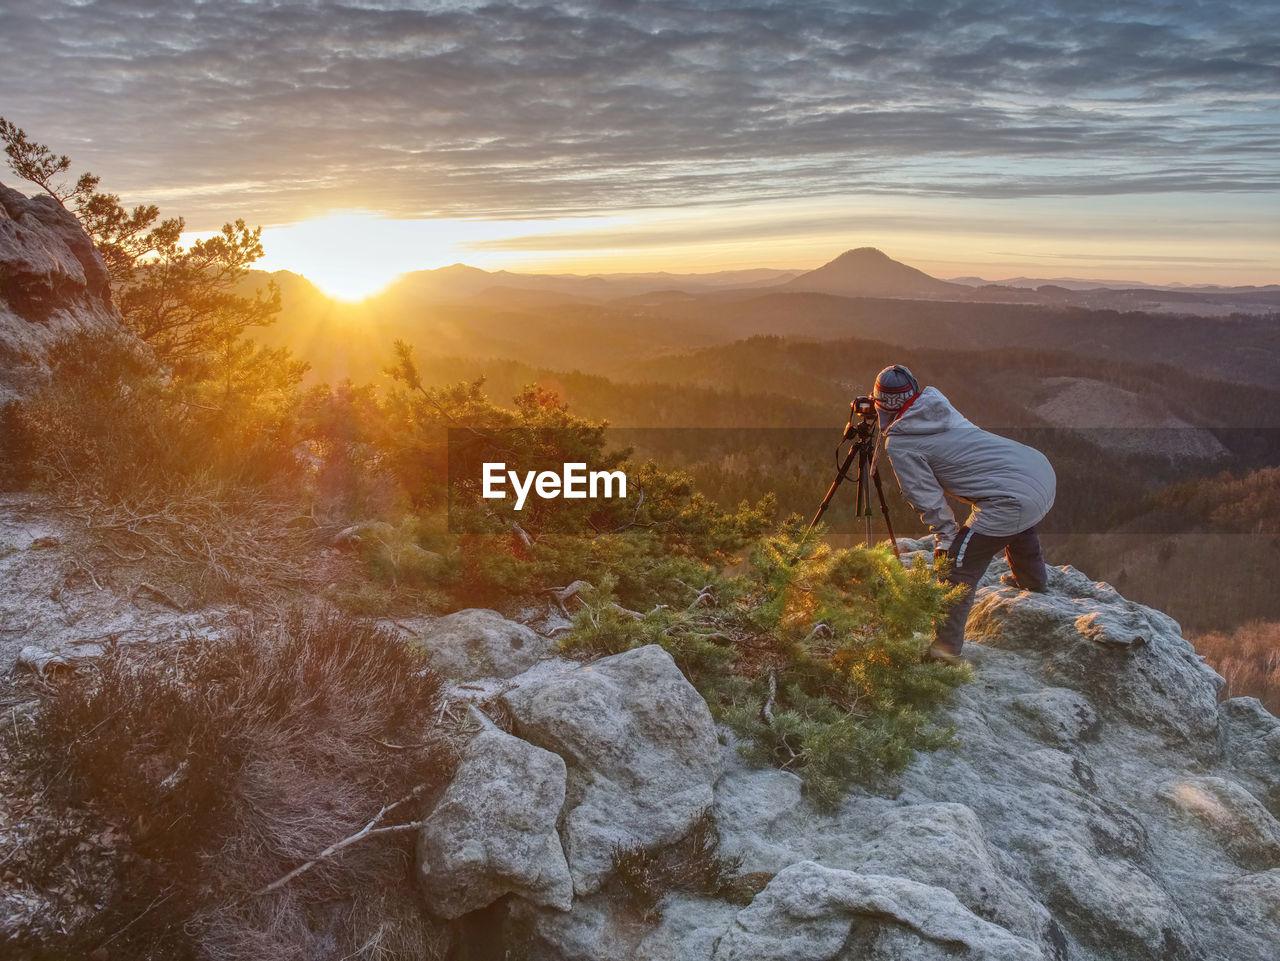 Woman art photographer works at camera on fiber glass tripod. misty spring daybreak above land